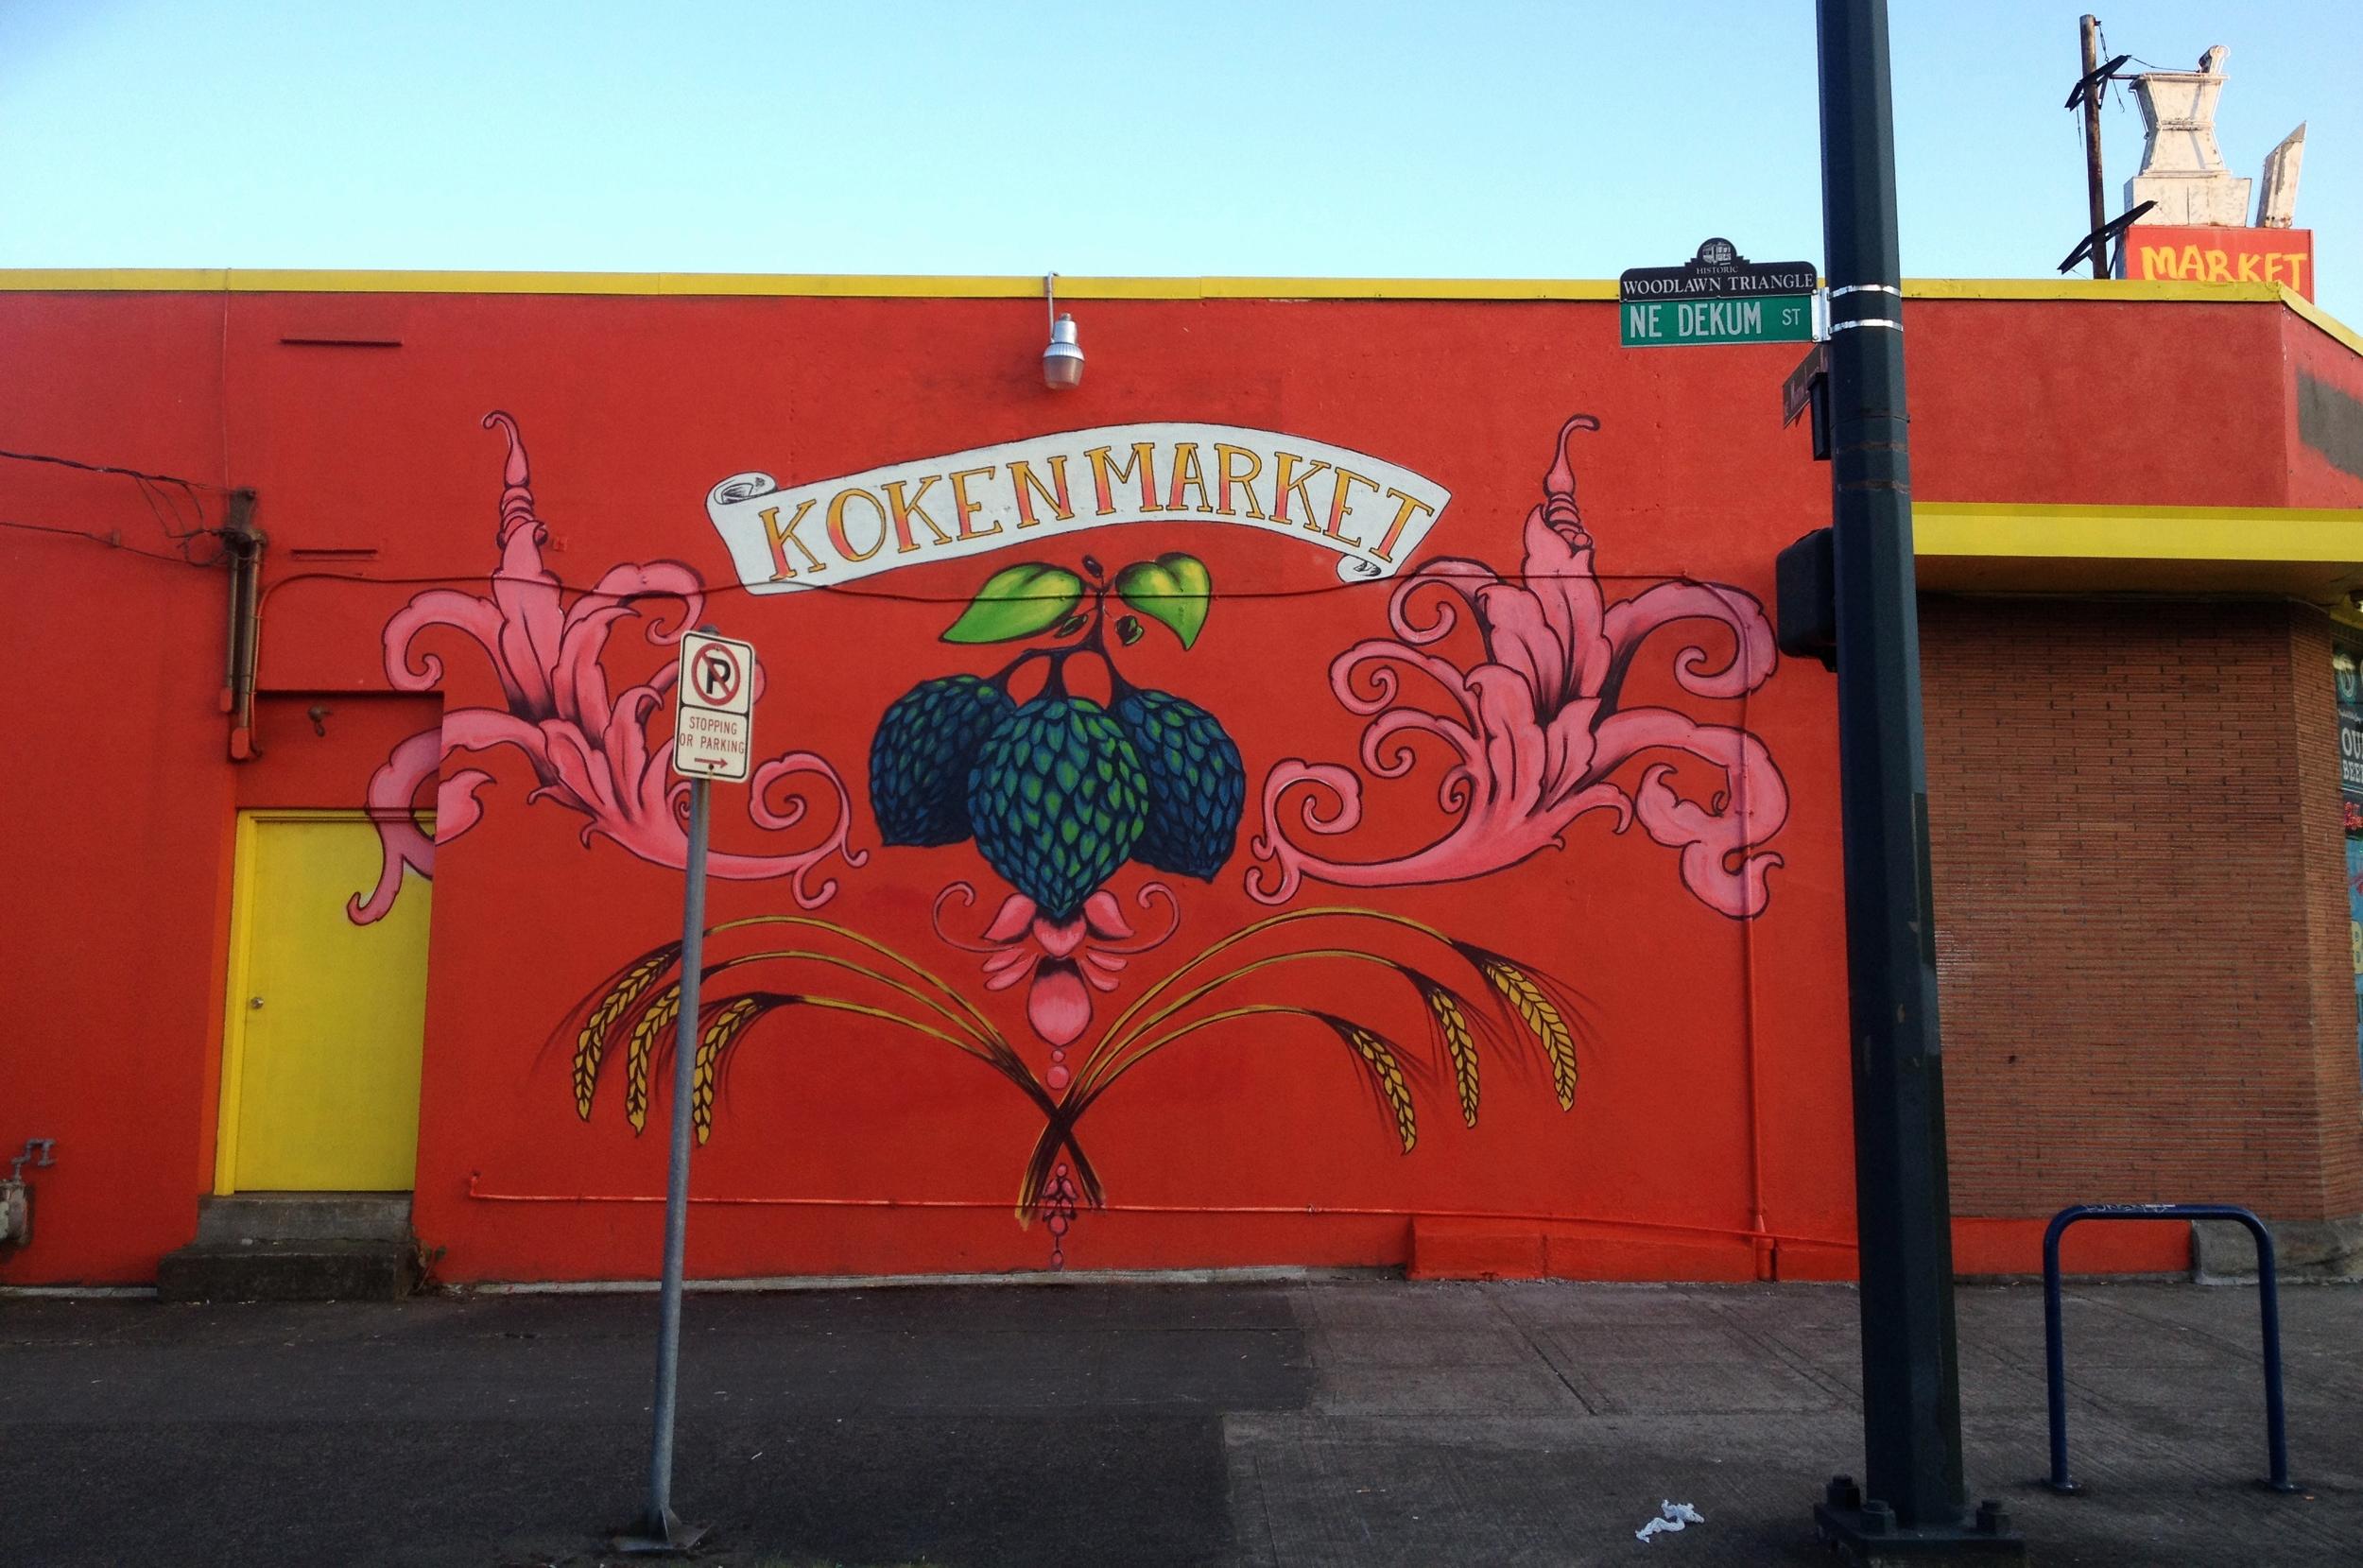 Koken Market mural design. Spray paint. 20' x 40'. 2013.